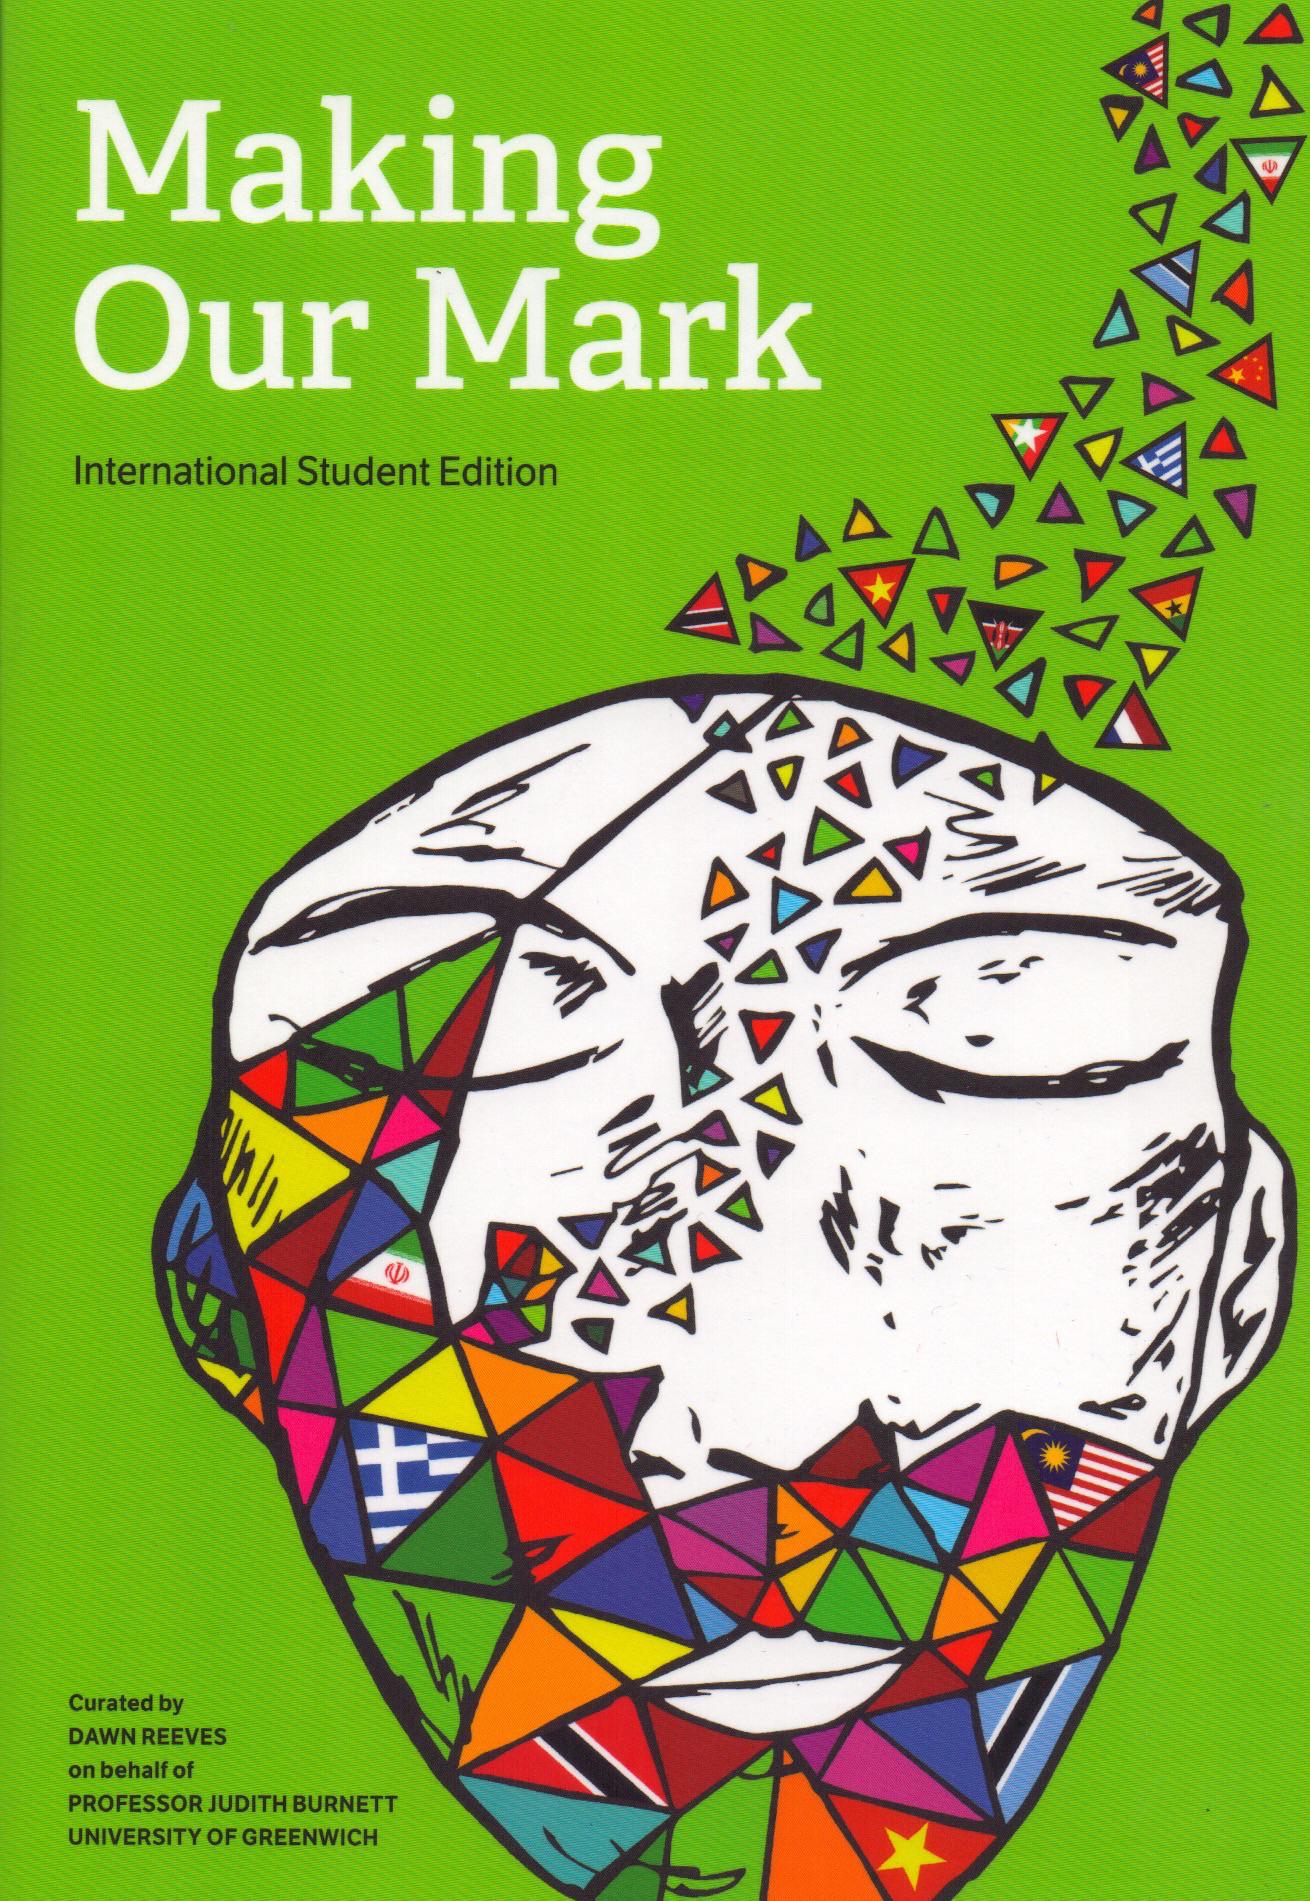 making our mark 3.jpg